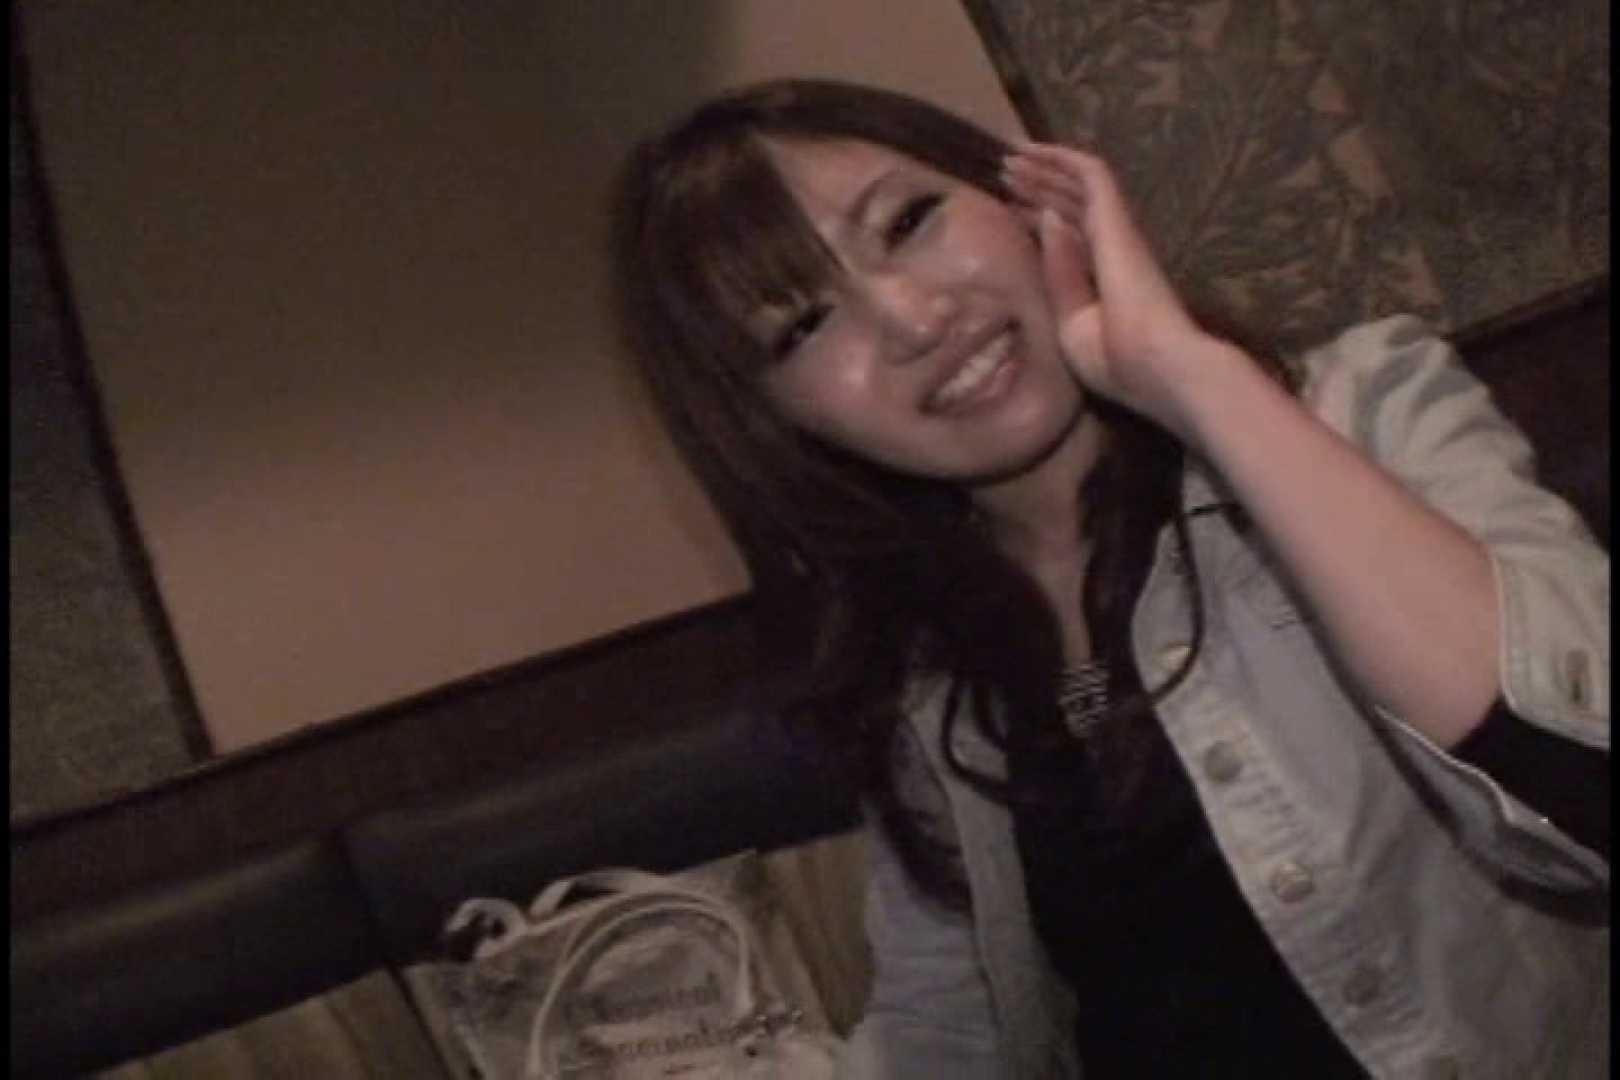 JDハンター全国ツアー vol.042 後編 女子大生丸裸  97pic 2